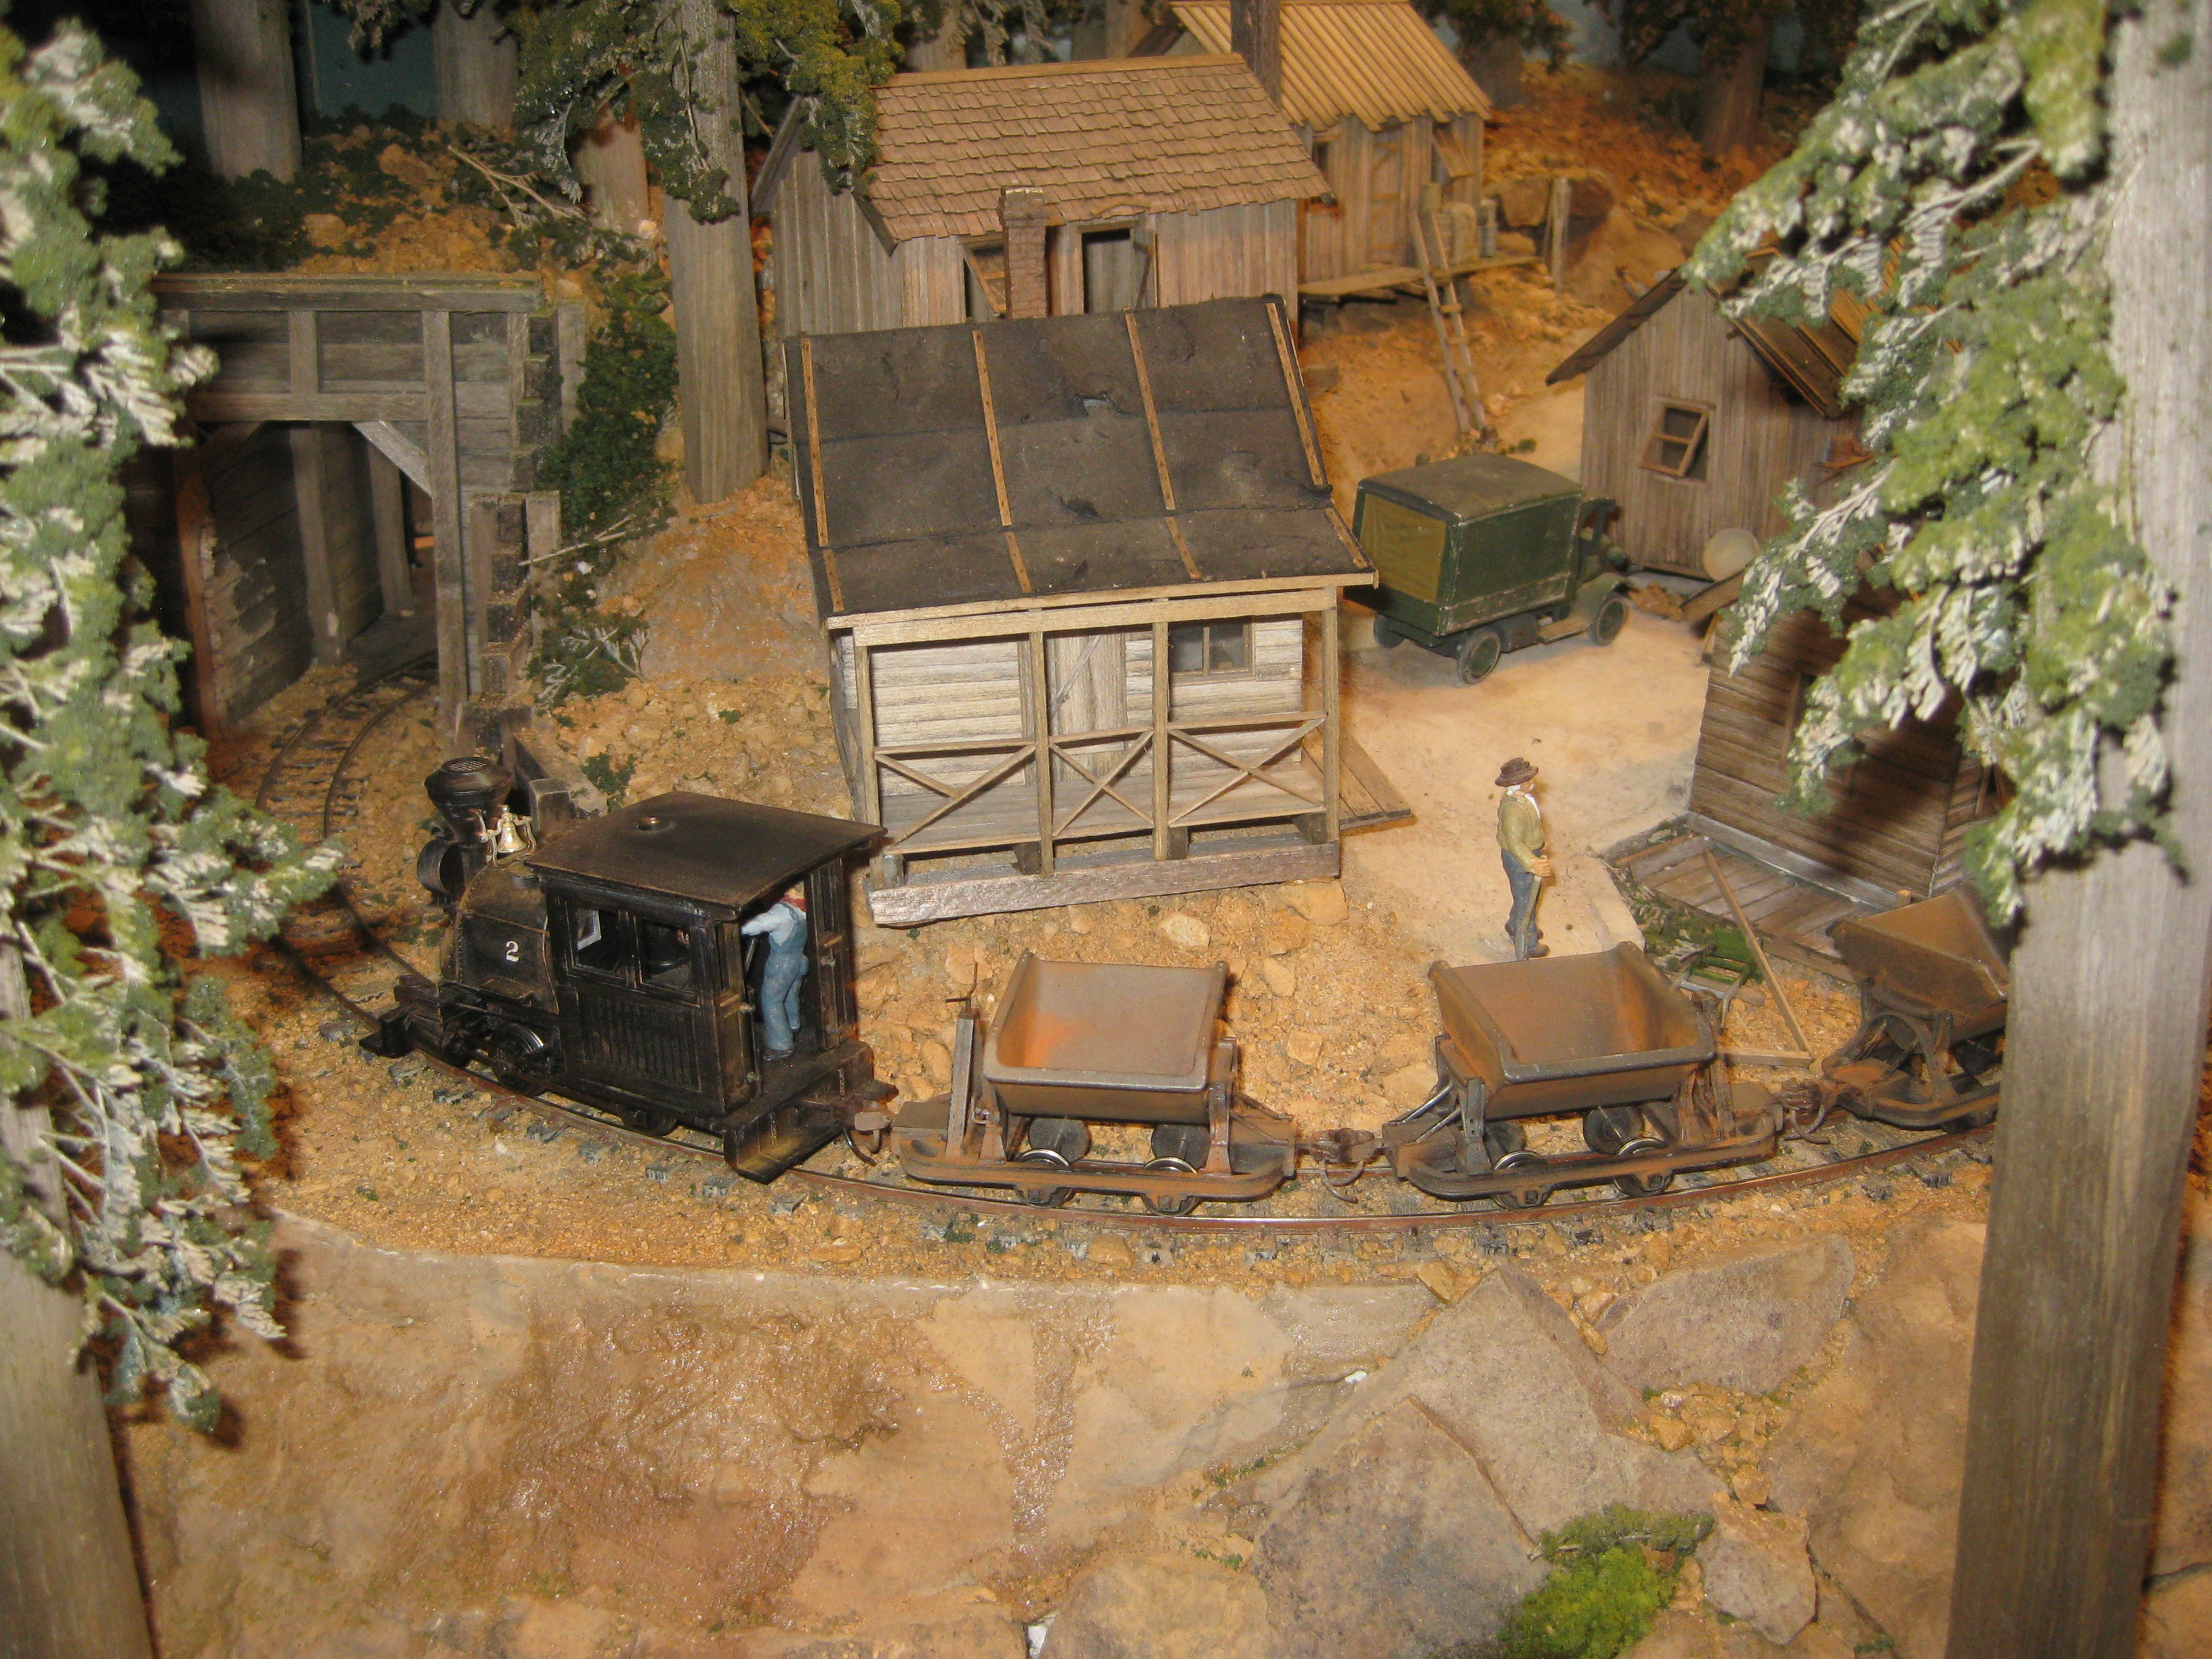 Ian S Coal Mine Layout Model Railroad Layouts Plansmodel